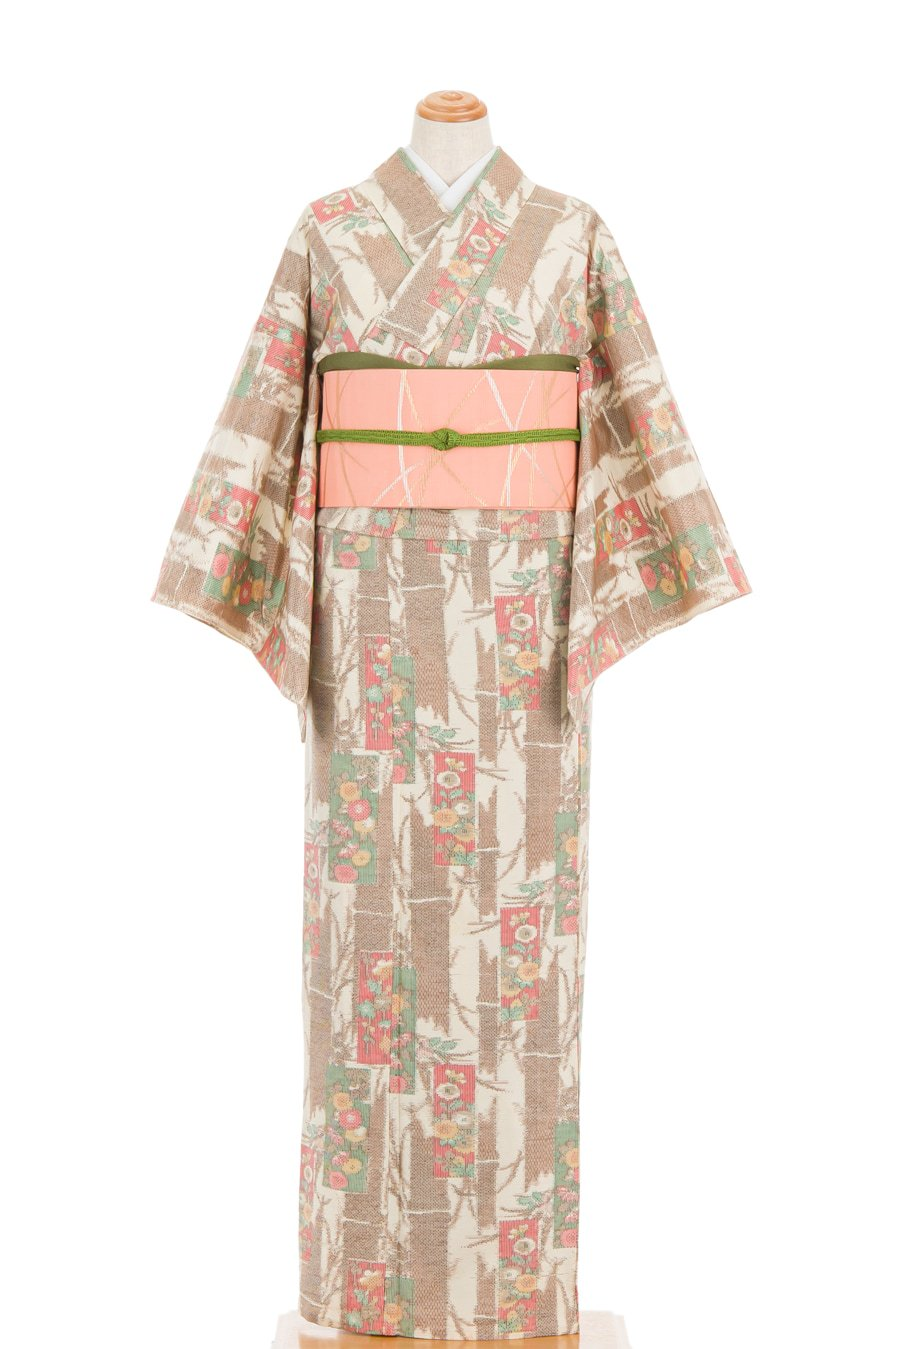 「単衣 紬 花絵札」の商品画像